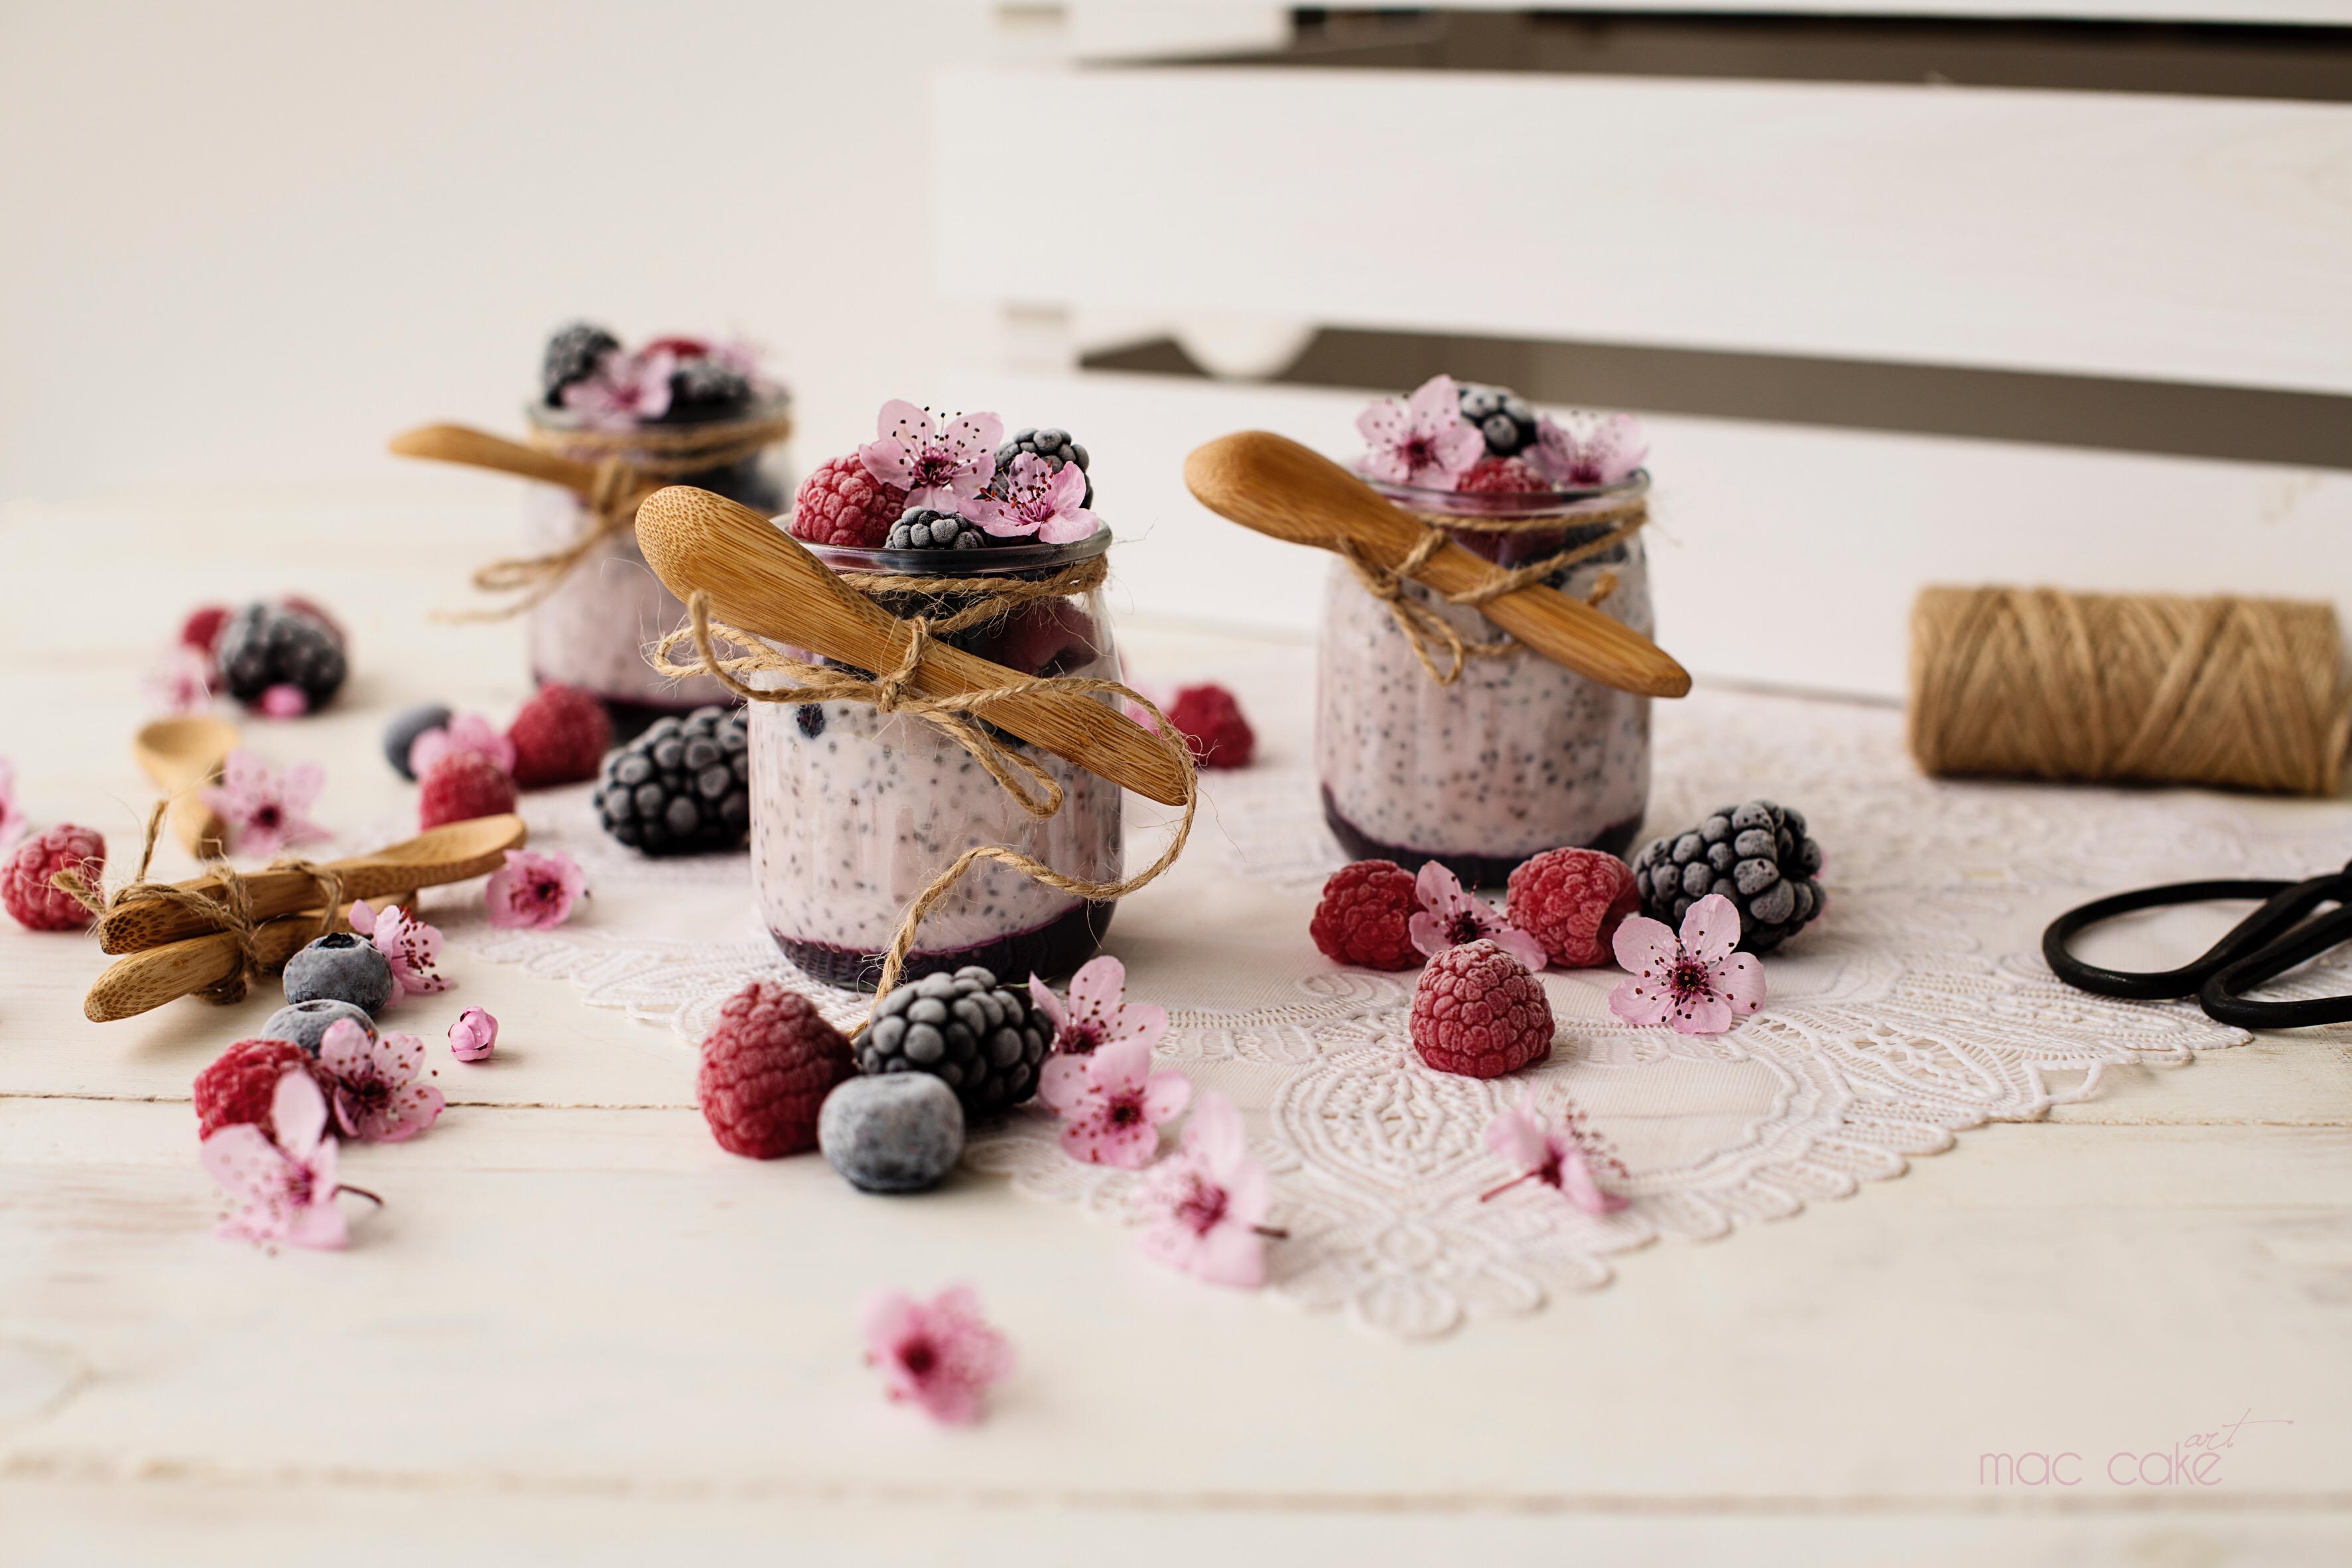 #sweet #postre #food #foodphotography